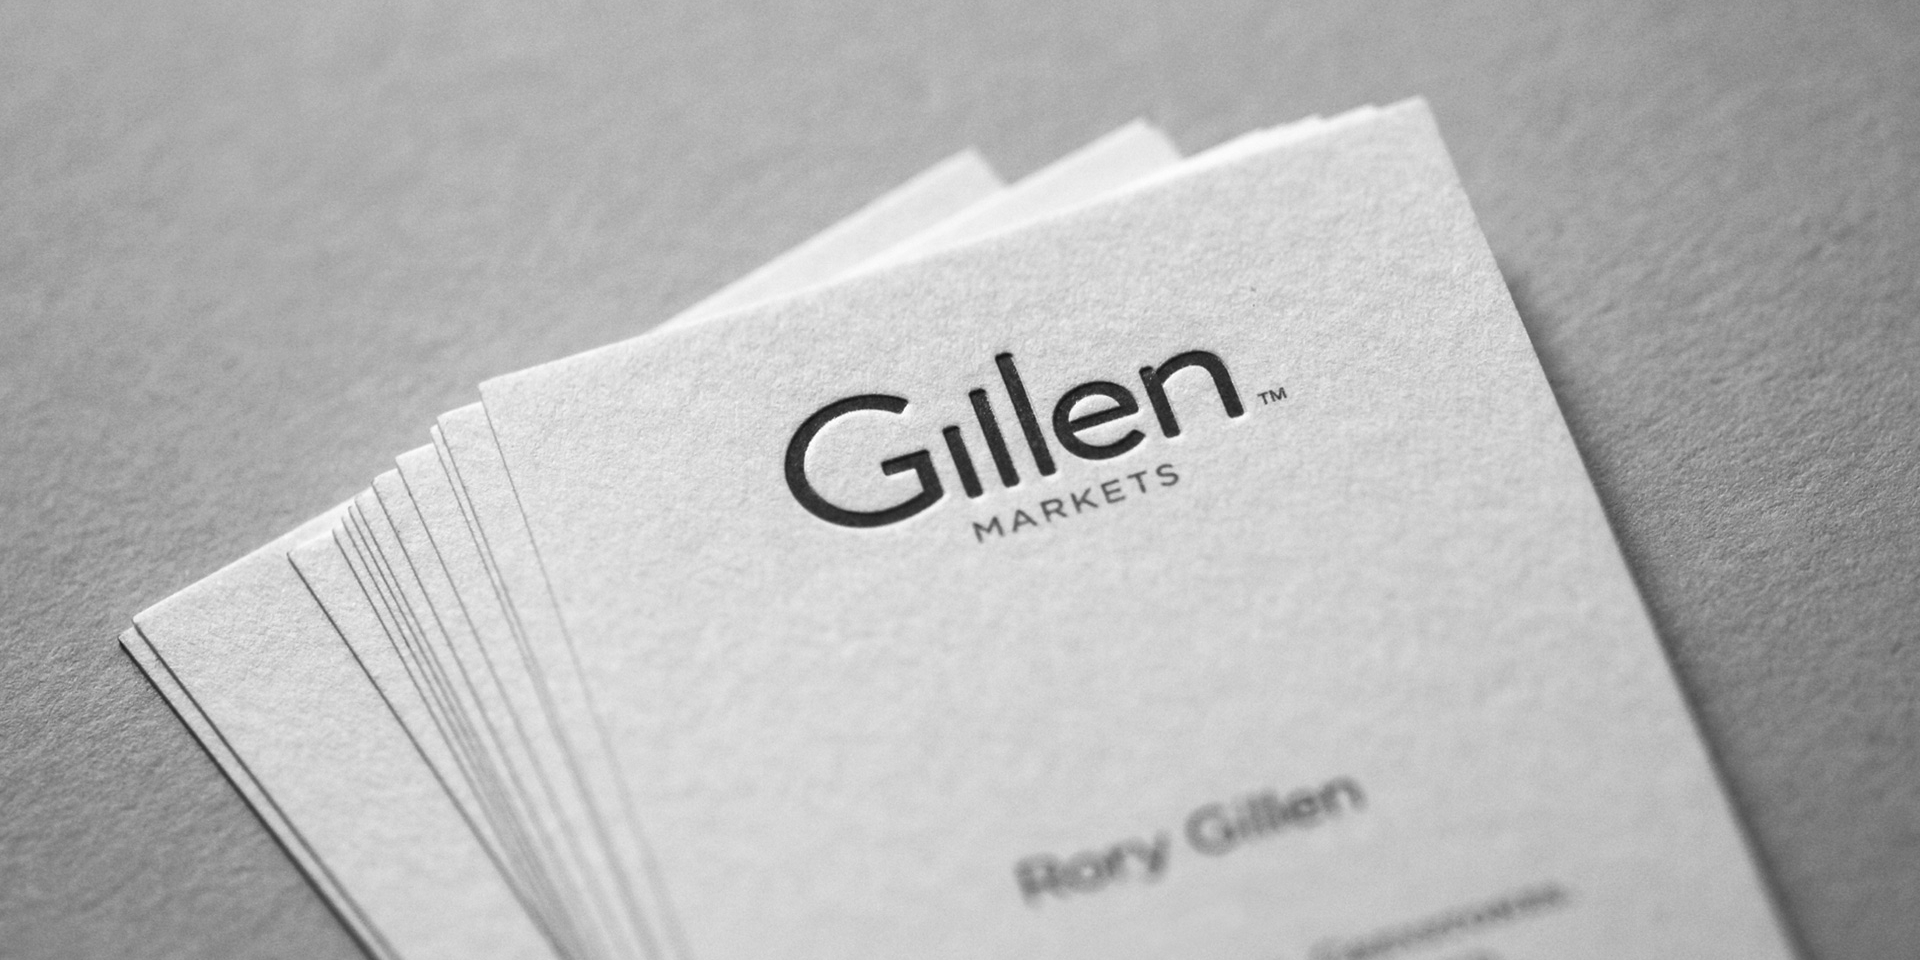 Gillen Markets Branding